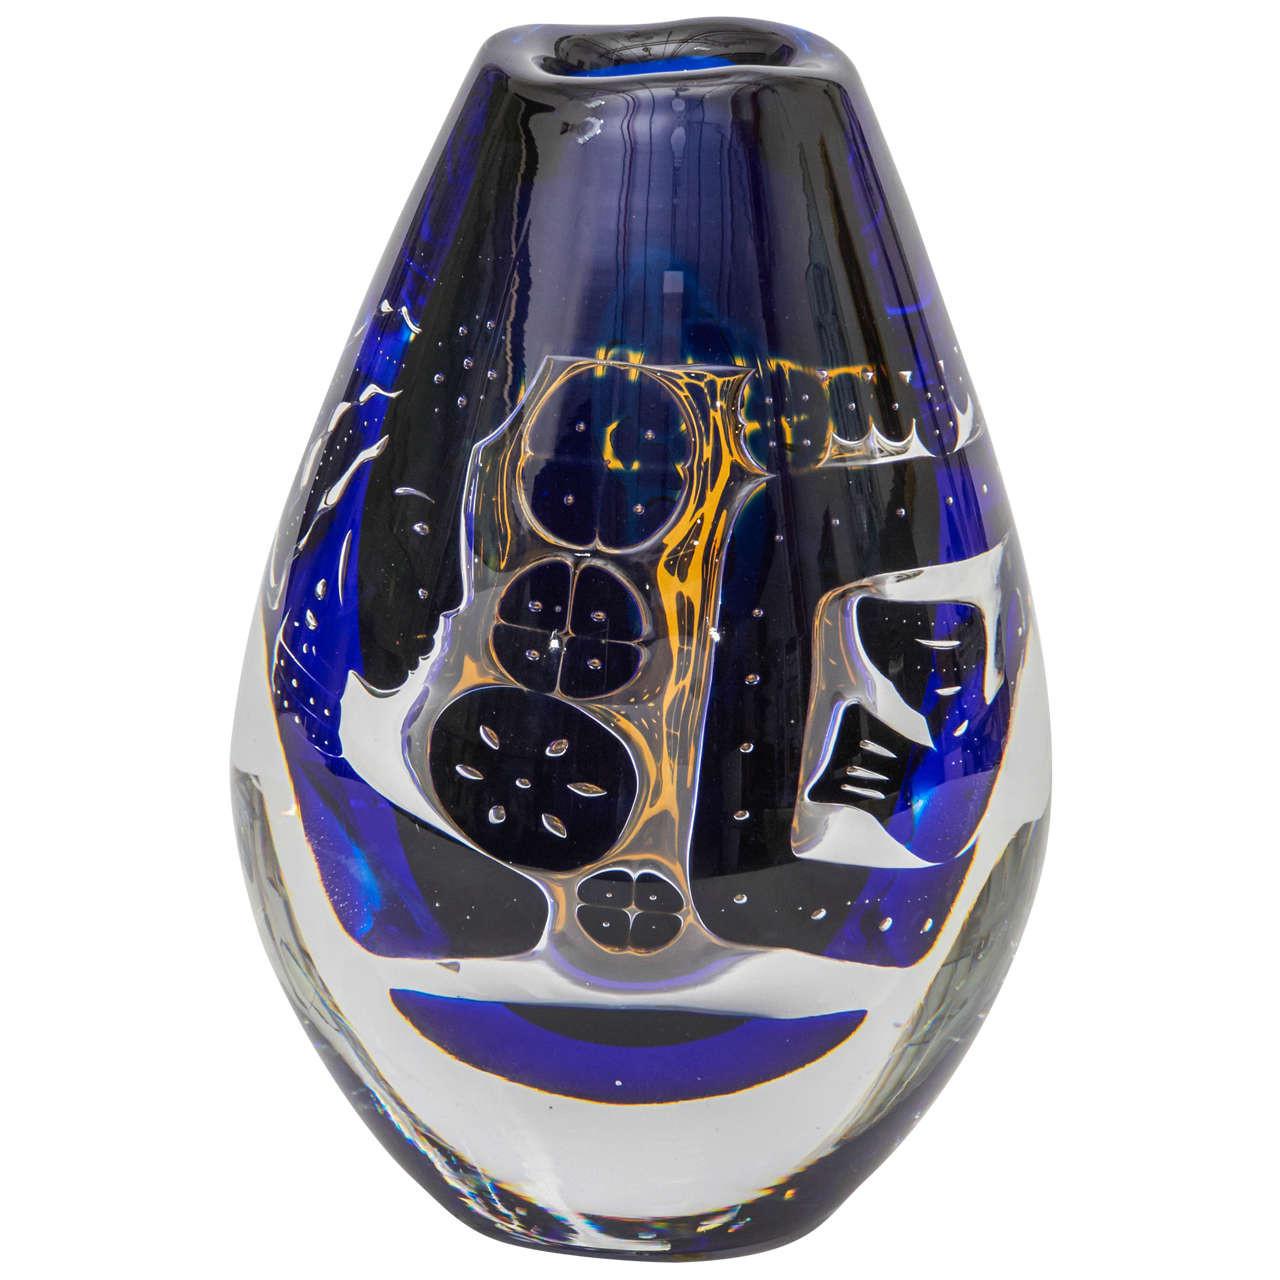 orrefors crystal bud vase of small orrefors vase bowl for sale at 1stdibs for orrefors vase modern orrefors circular glass bowl